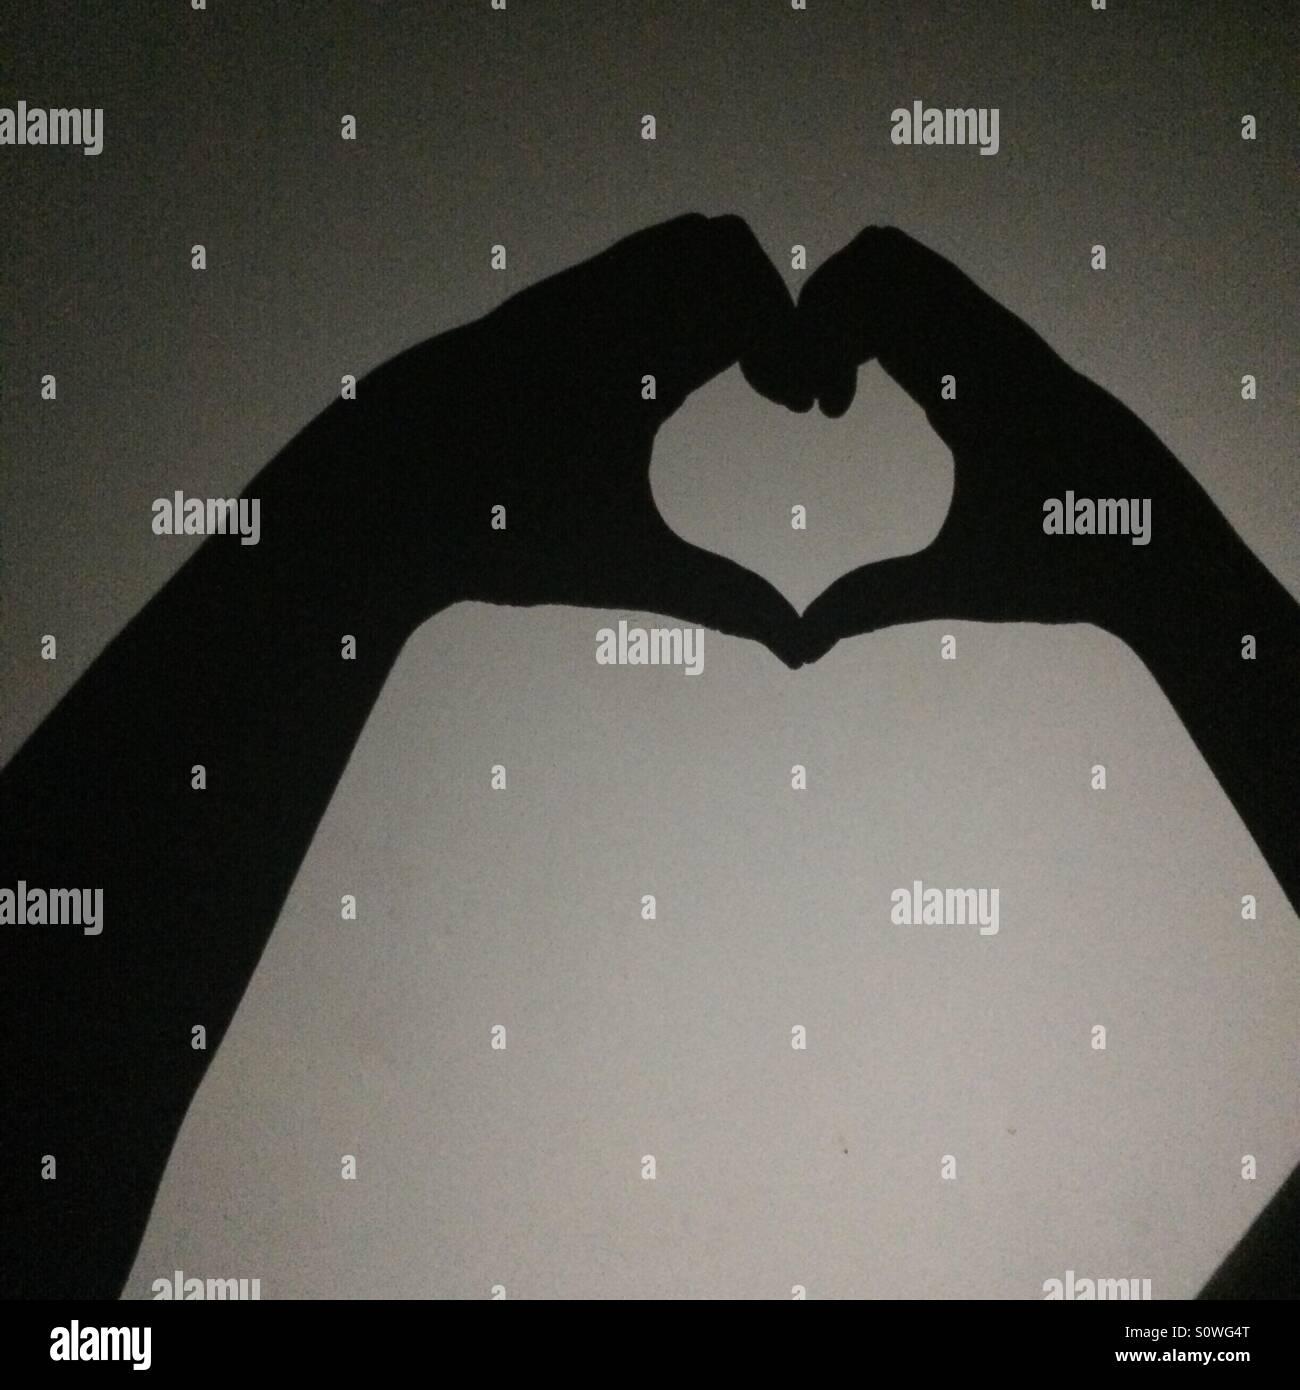 Amour Photo Stock